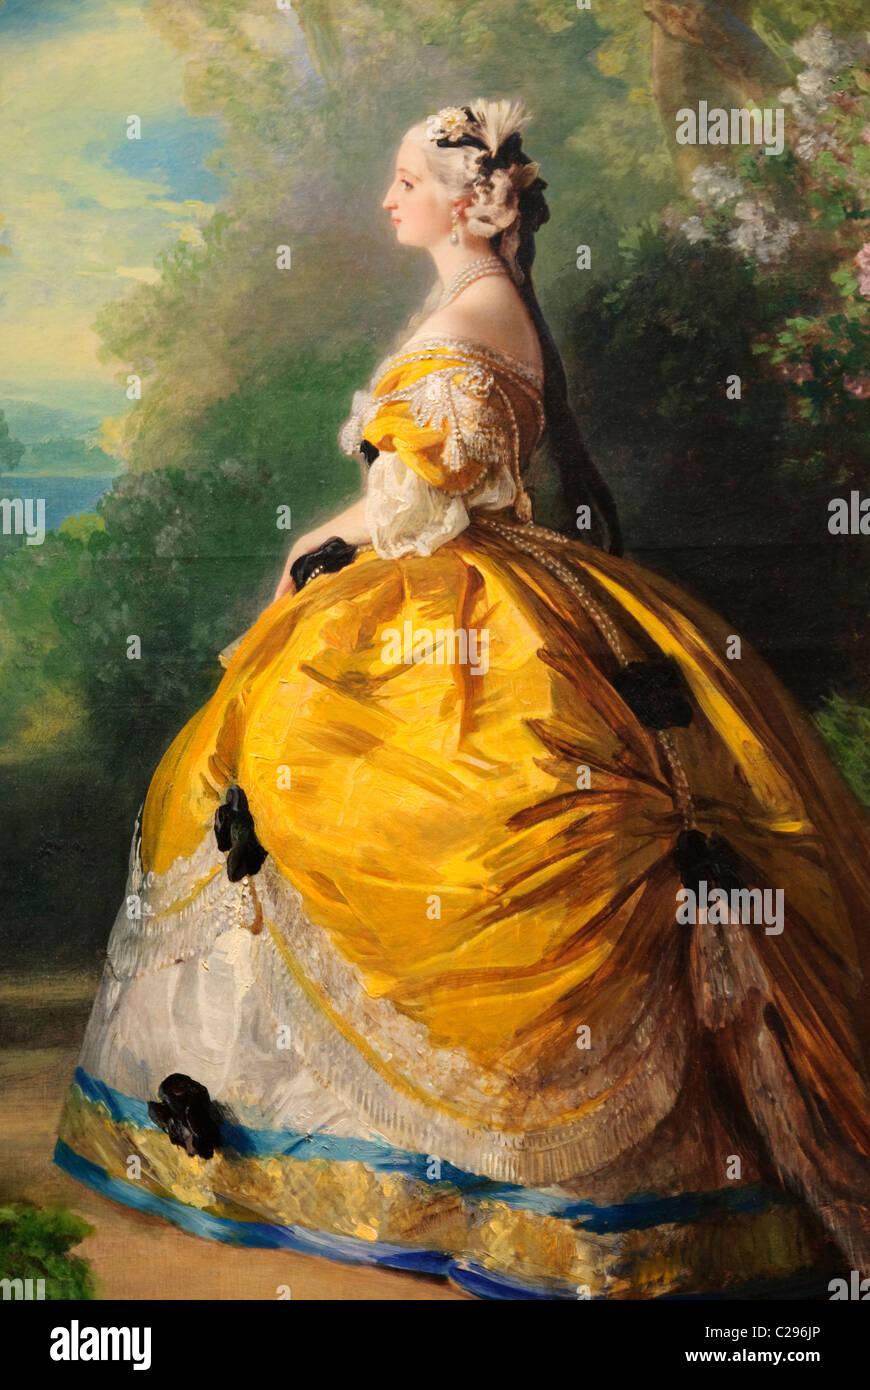 Dettaglio: l'Imperatrice Eugénie, (Eugénie de Montijo, 1826-1920, Condesa de Teba), 1854, di Franz Immagini Stock